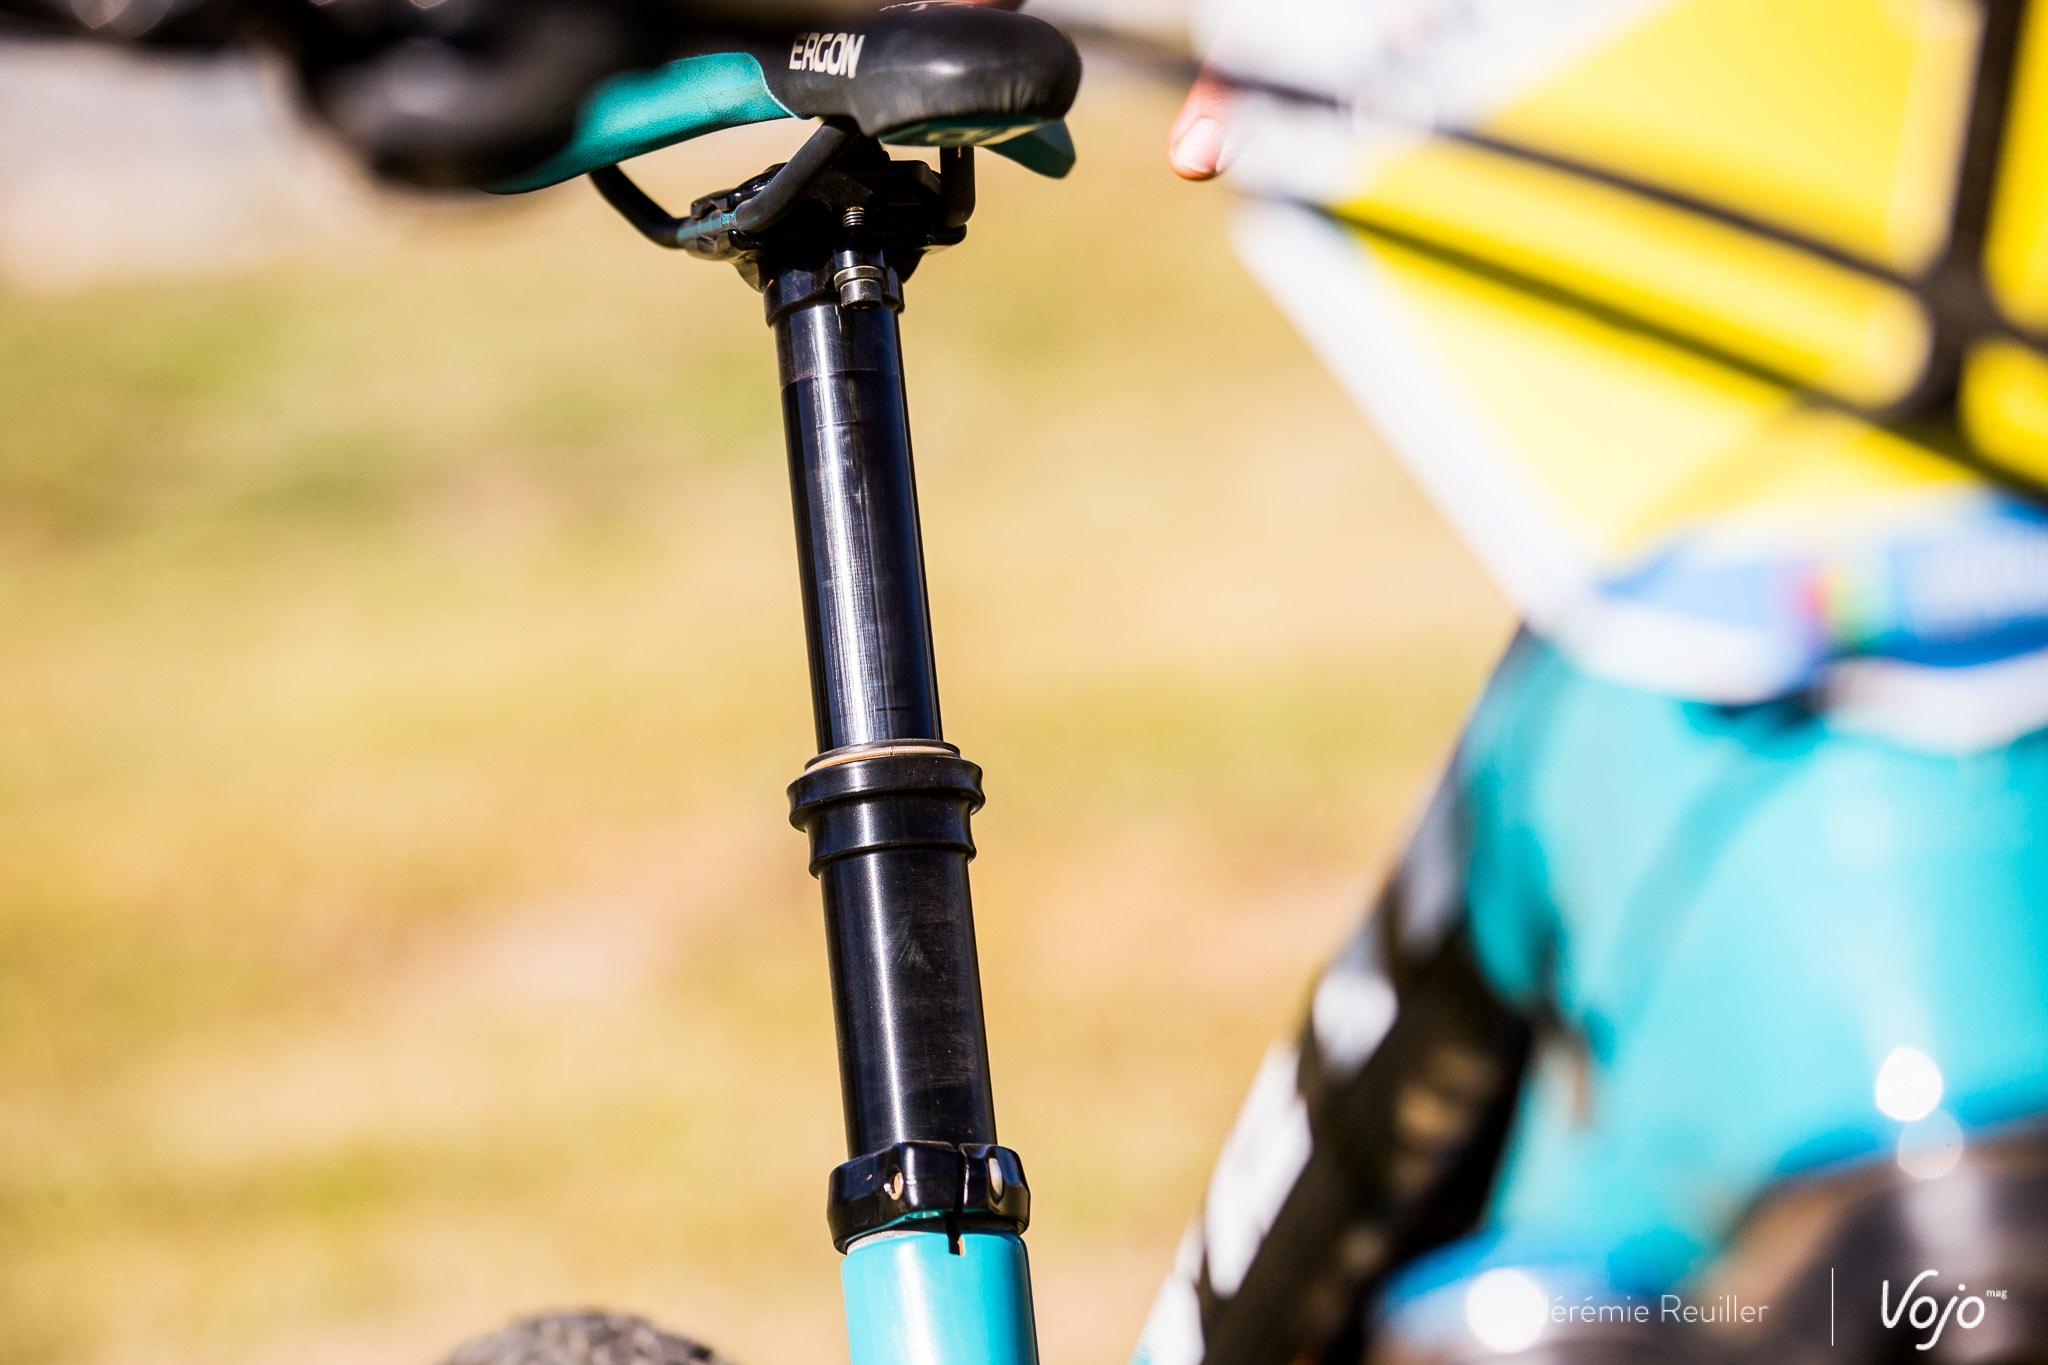 Bike_Check__Rude_Fox_EWS_1_Copyright_Reuiller_Vojomag-2